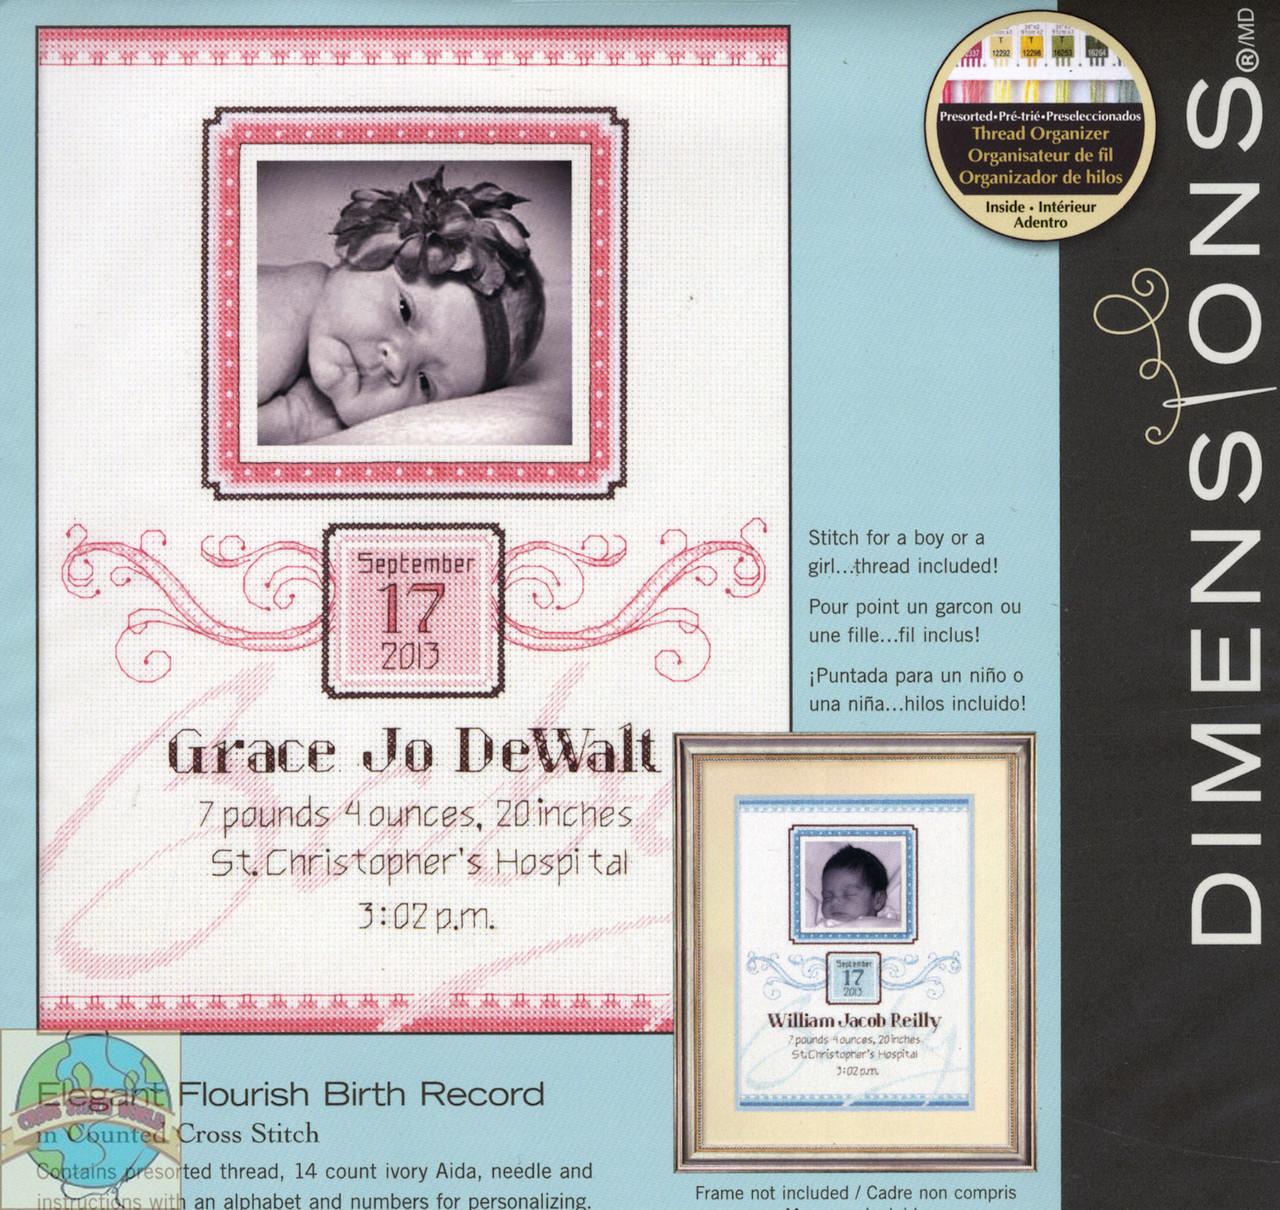 Dimensions - Elegant Flourish Birth Record